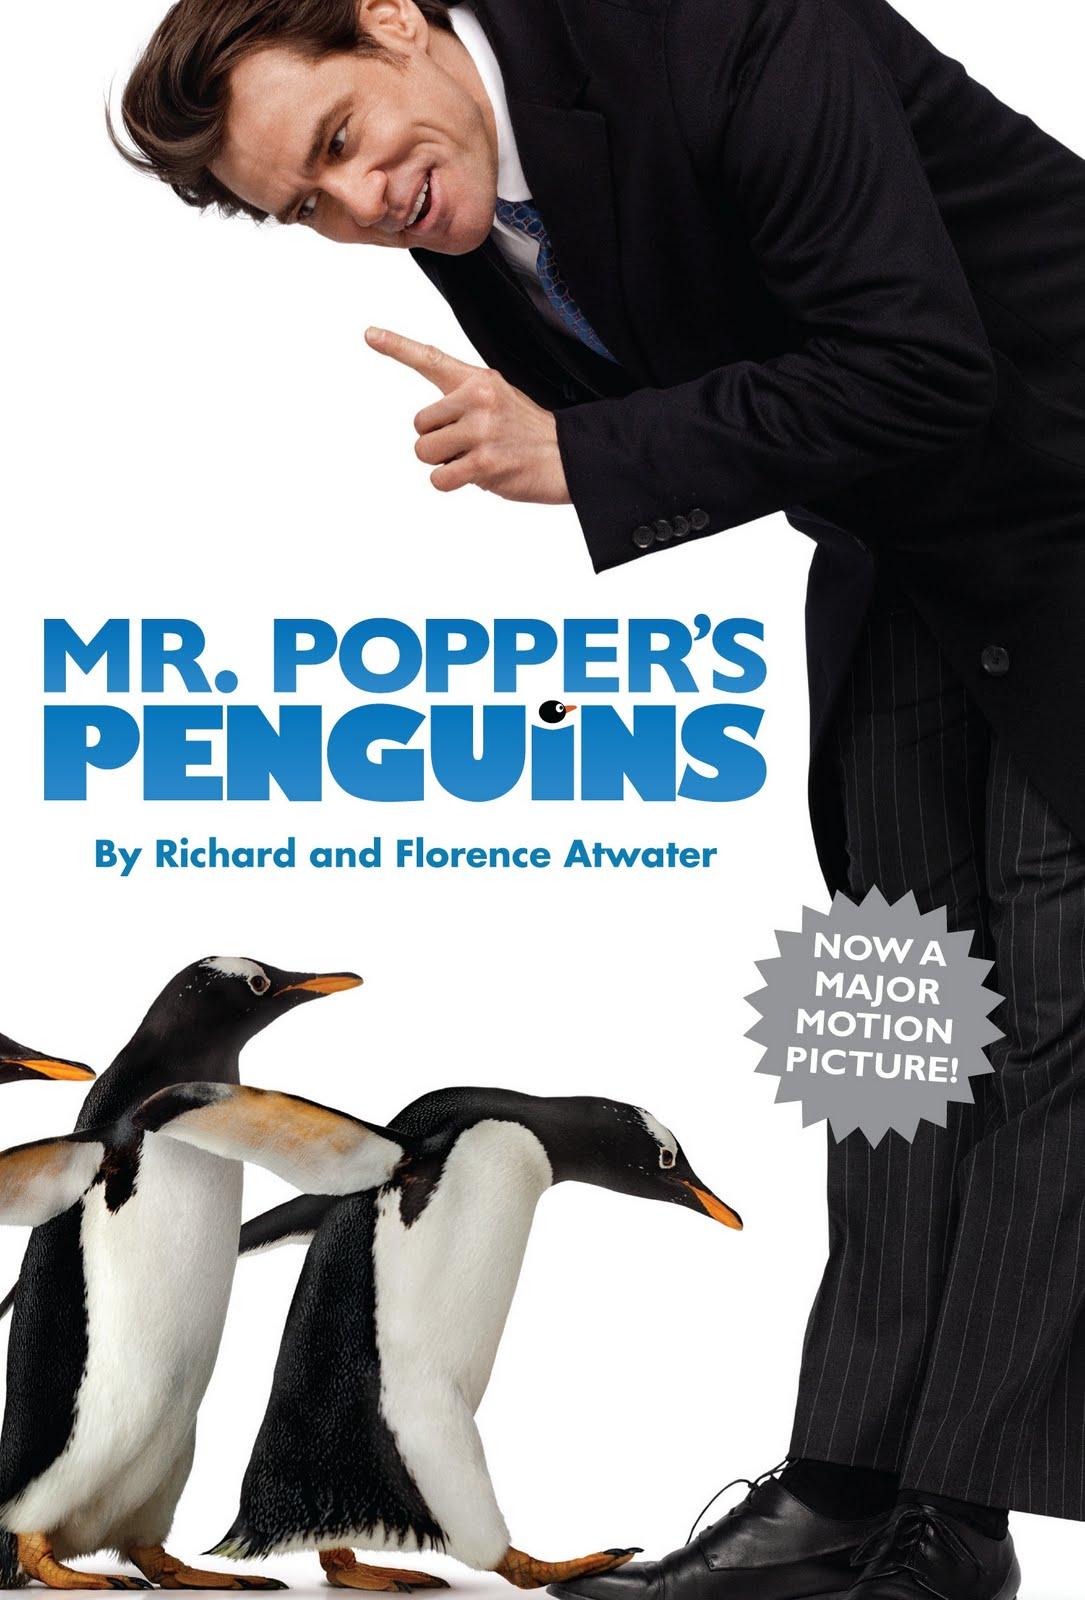 http://4.bp.blogspot.com/-9a8QTpIr6vg/TpQDkhov0jI/AAAAAAAASVk/EJ2NH52m1iA/s1600/MPP-book-cover.jpg